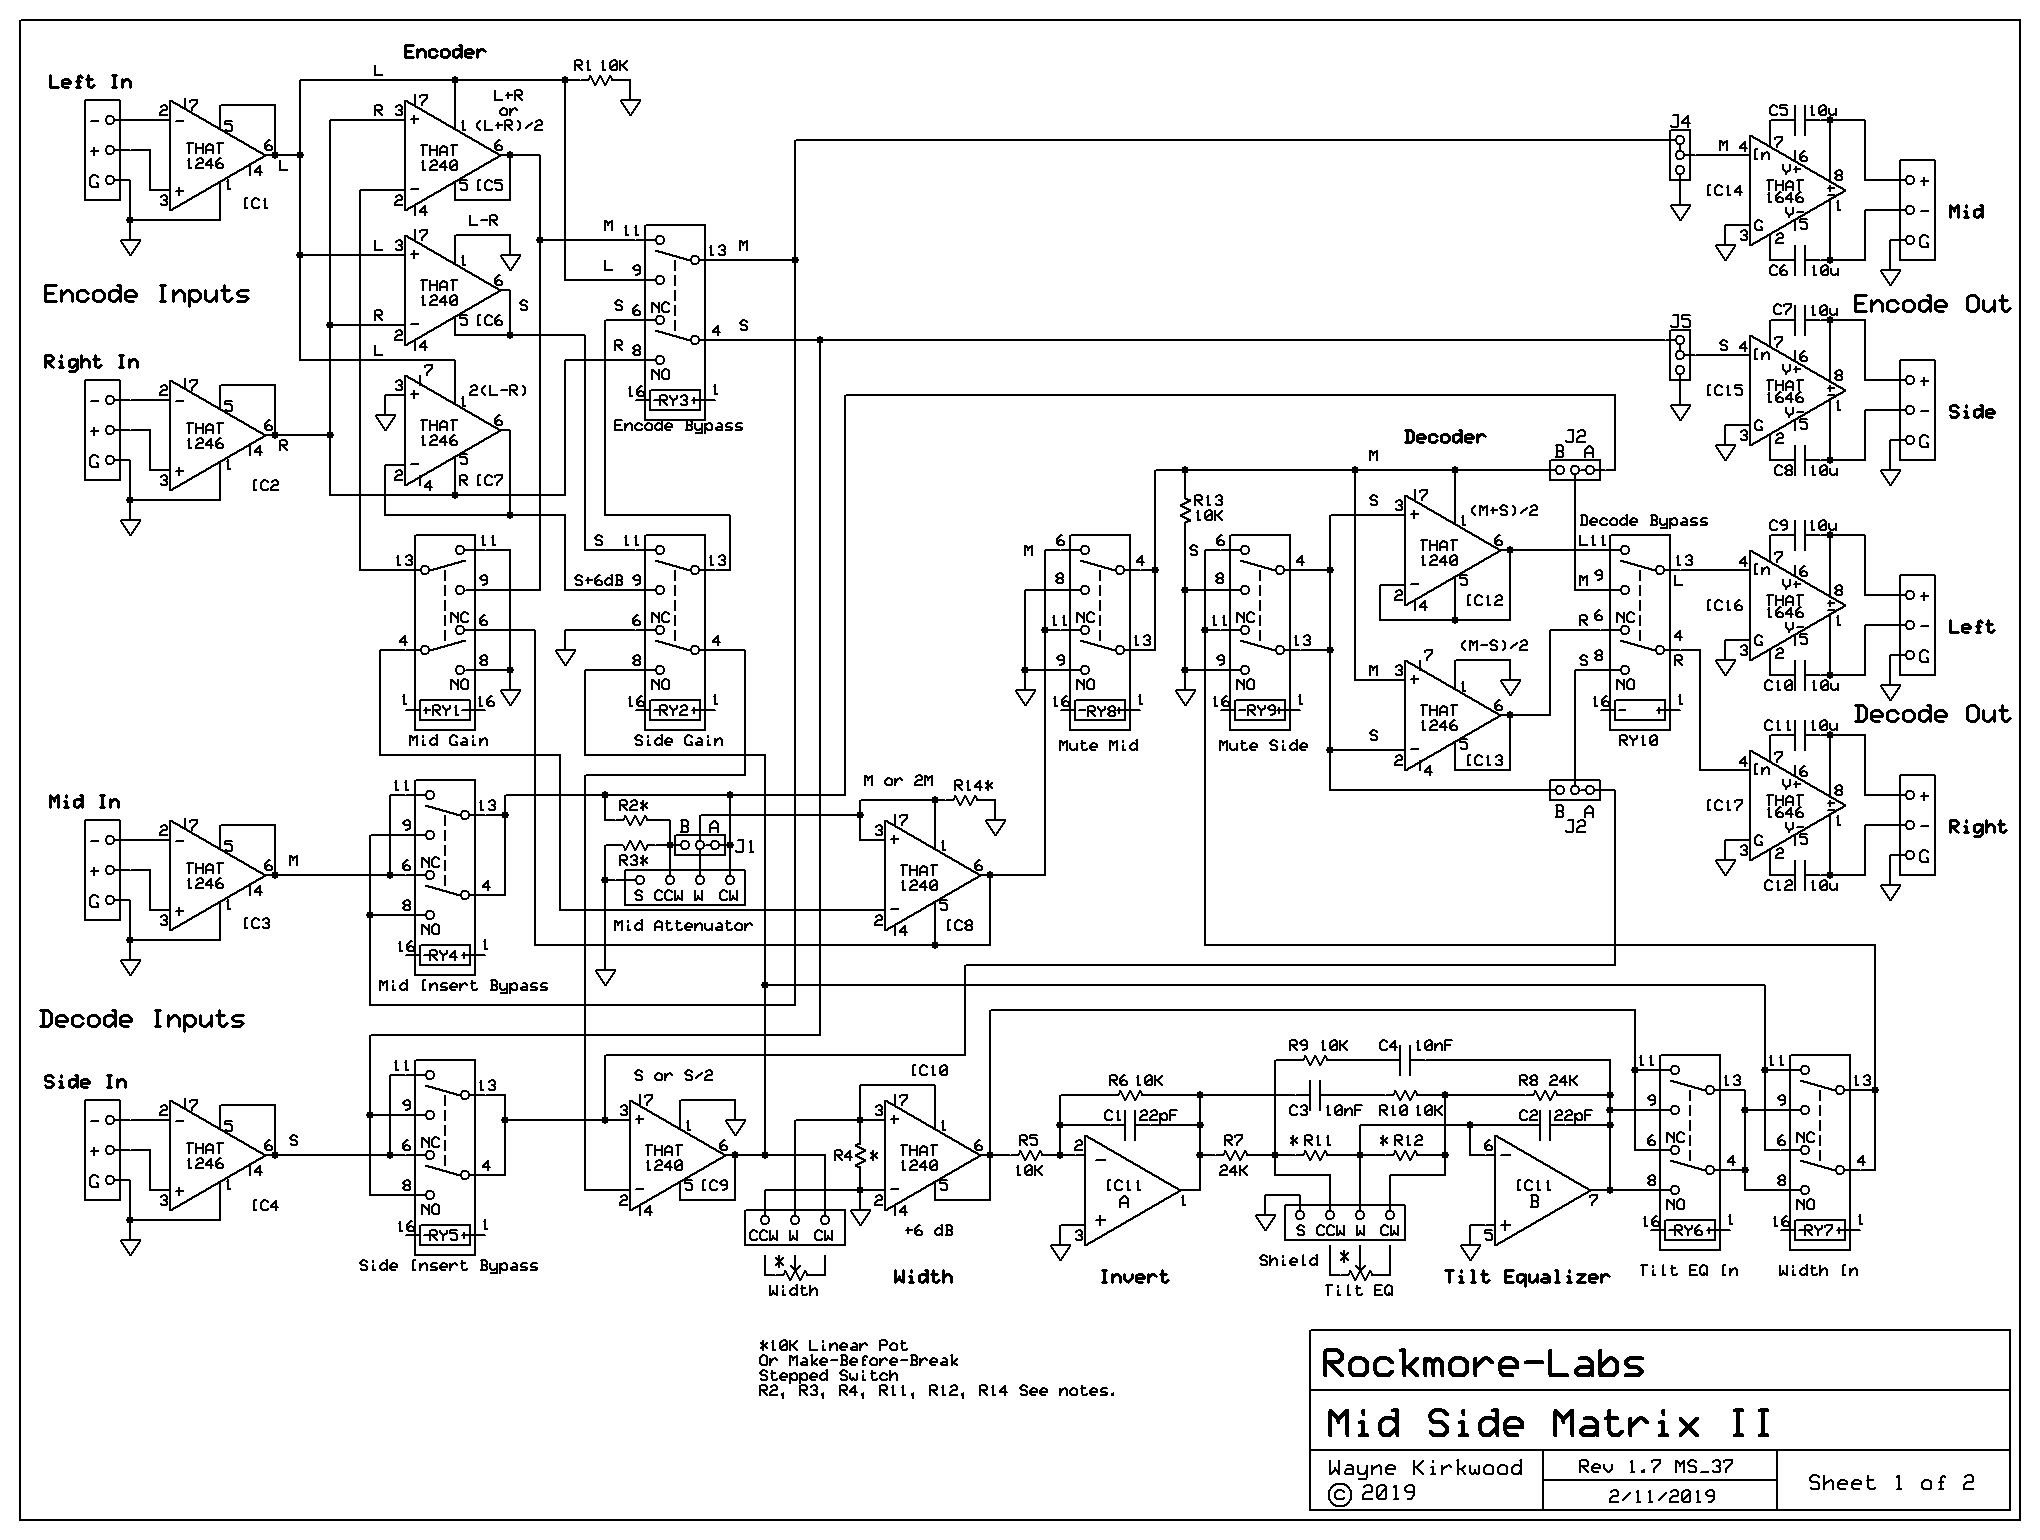 mtc-ms-ii mid side matrix construction information